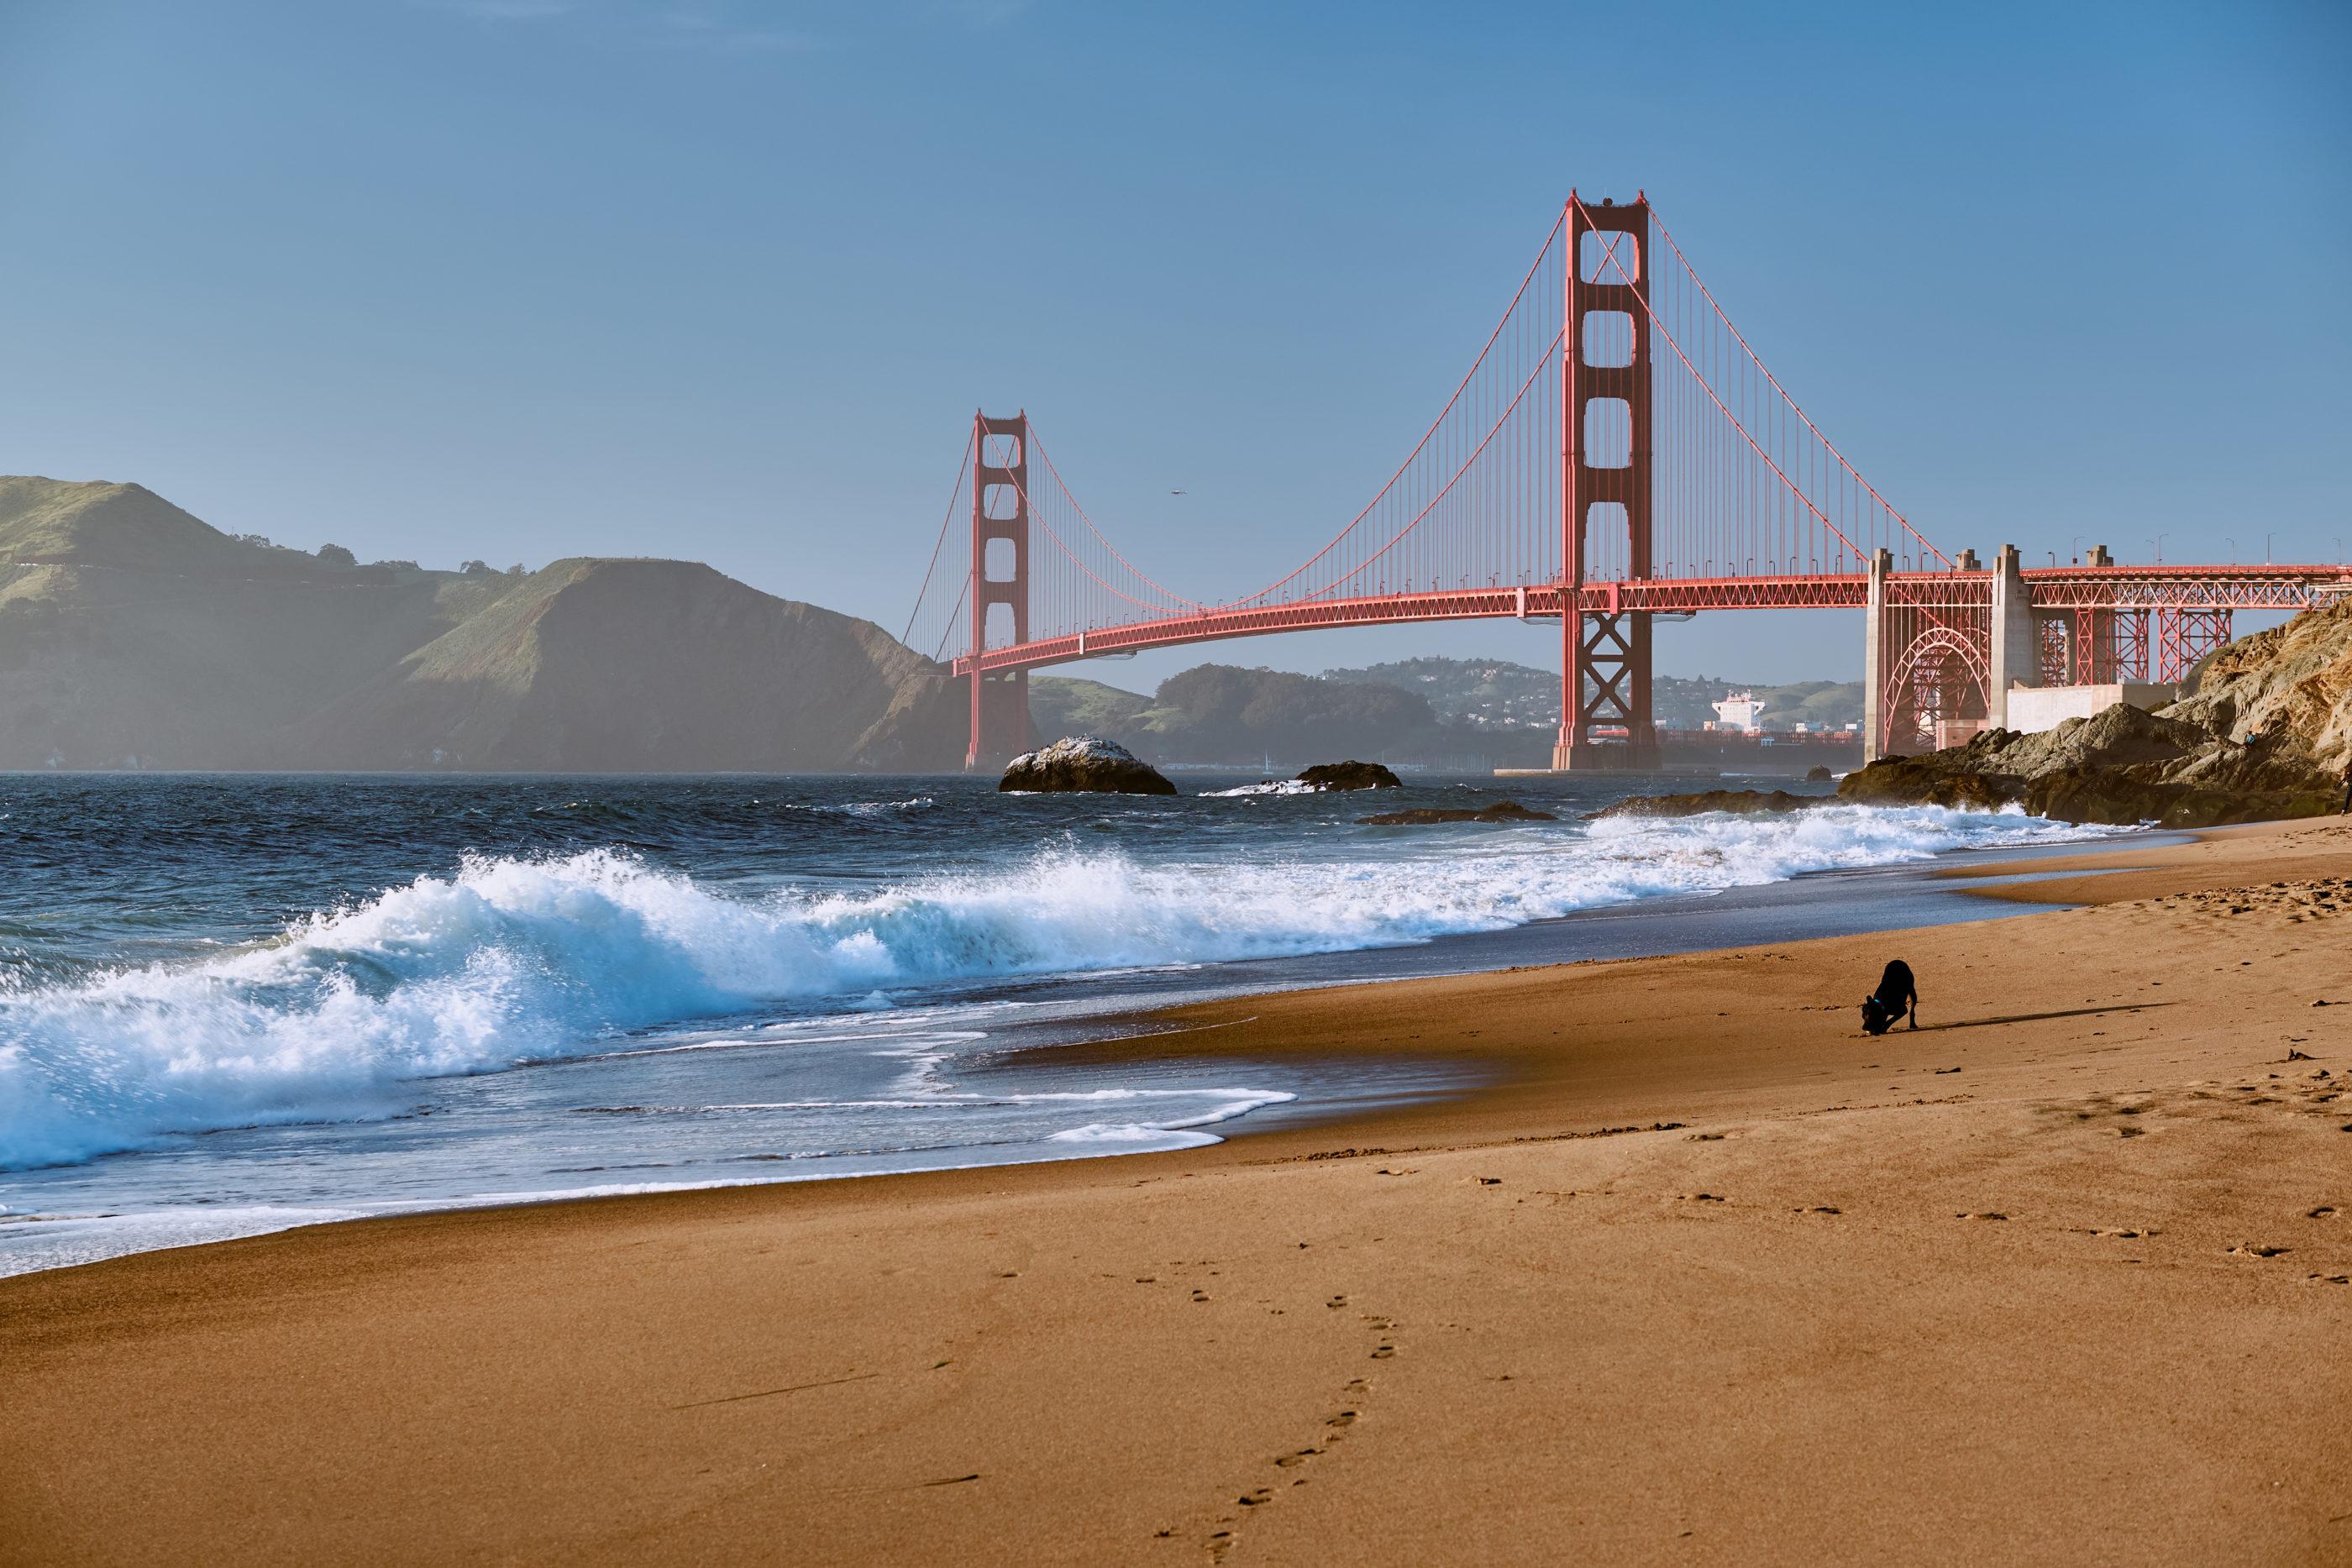 Best San Francisco beaches: Baker Beach